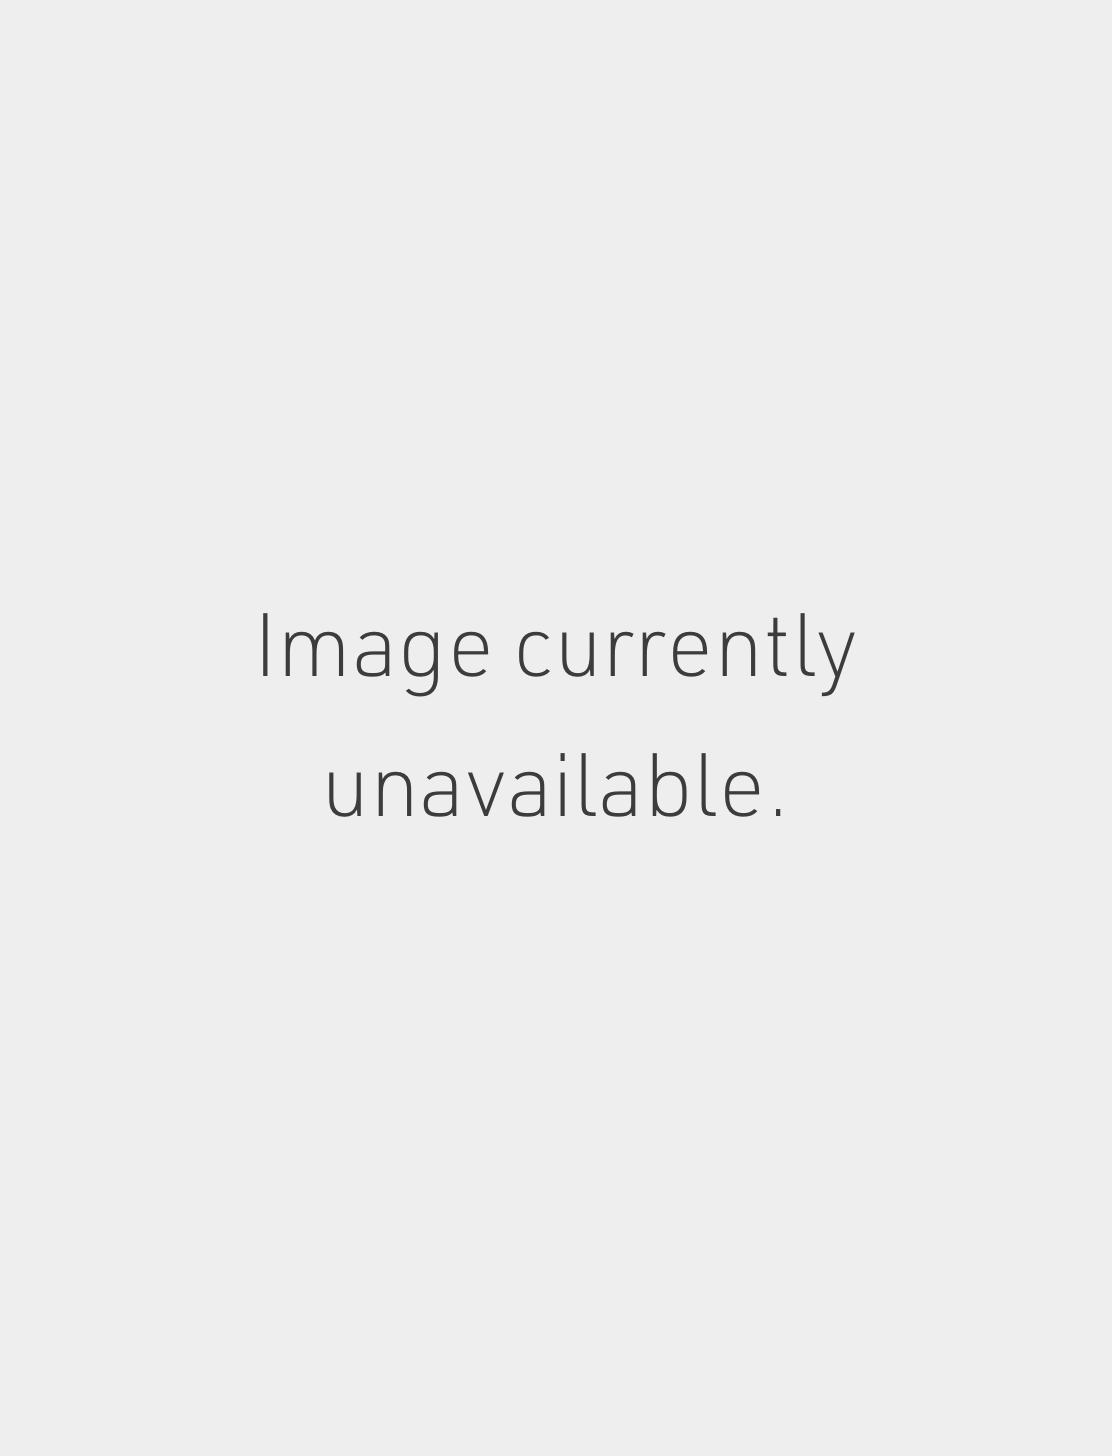 18k 7mm Square Diamond Bar Tash Thread - WHITE GOLD Image #2